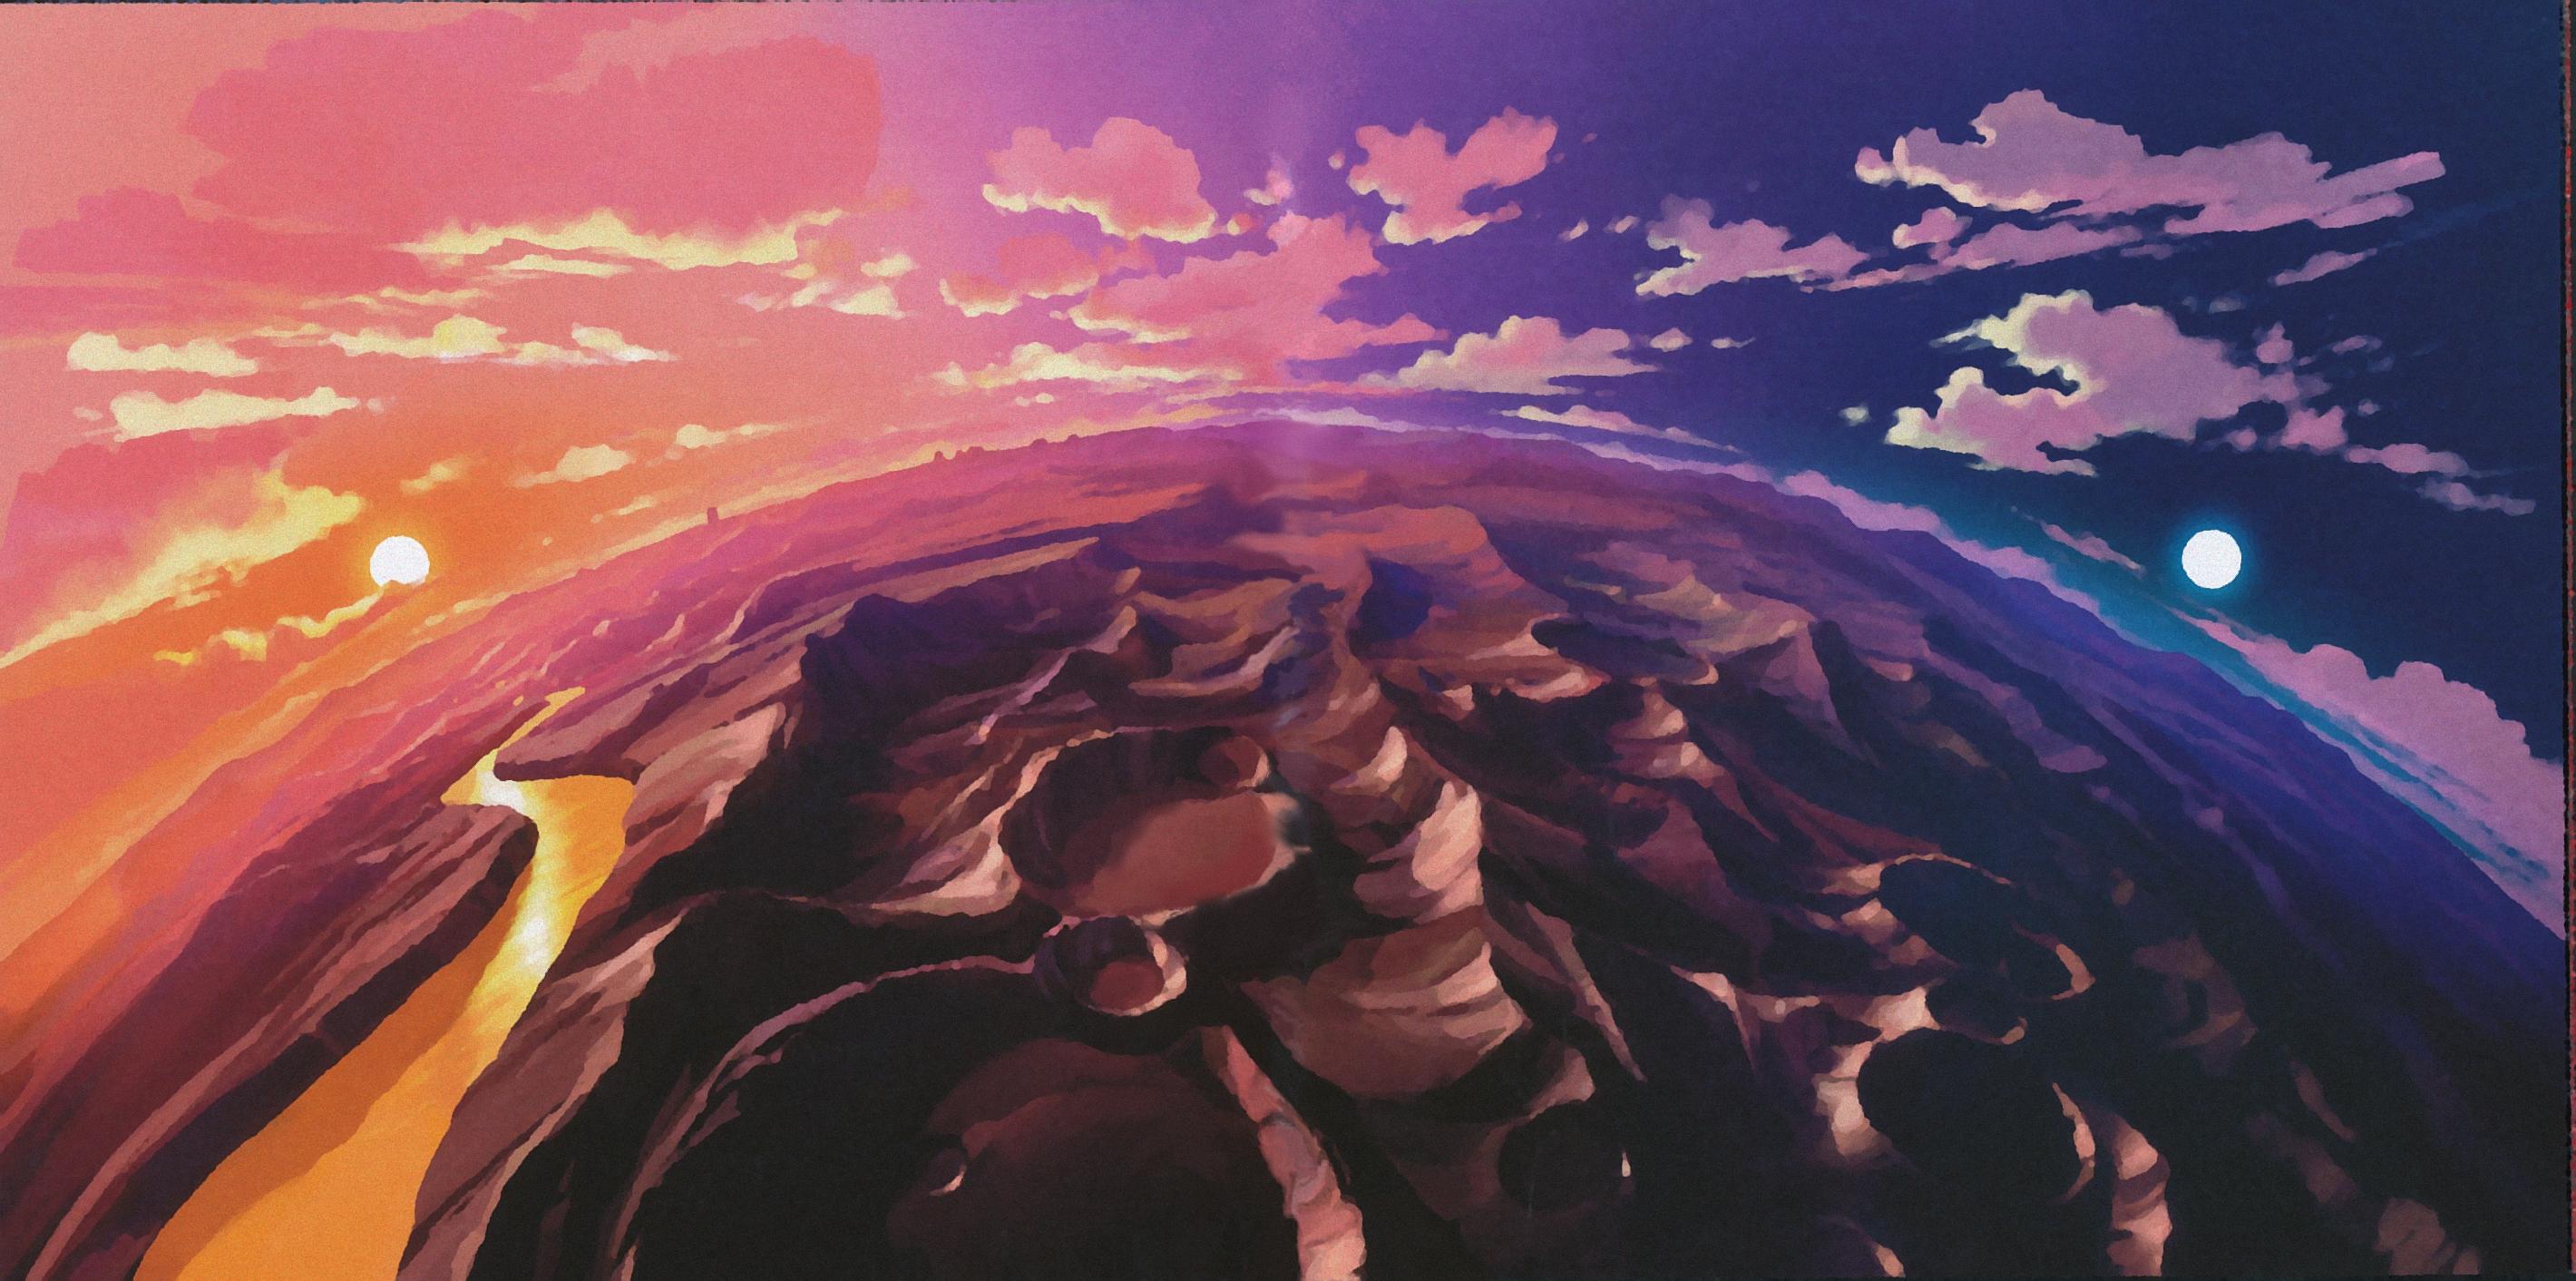 47+ 5760x1080 Anime Wallpaper on WallpaperSafari